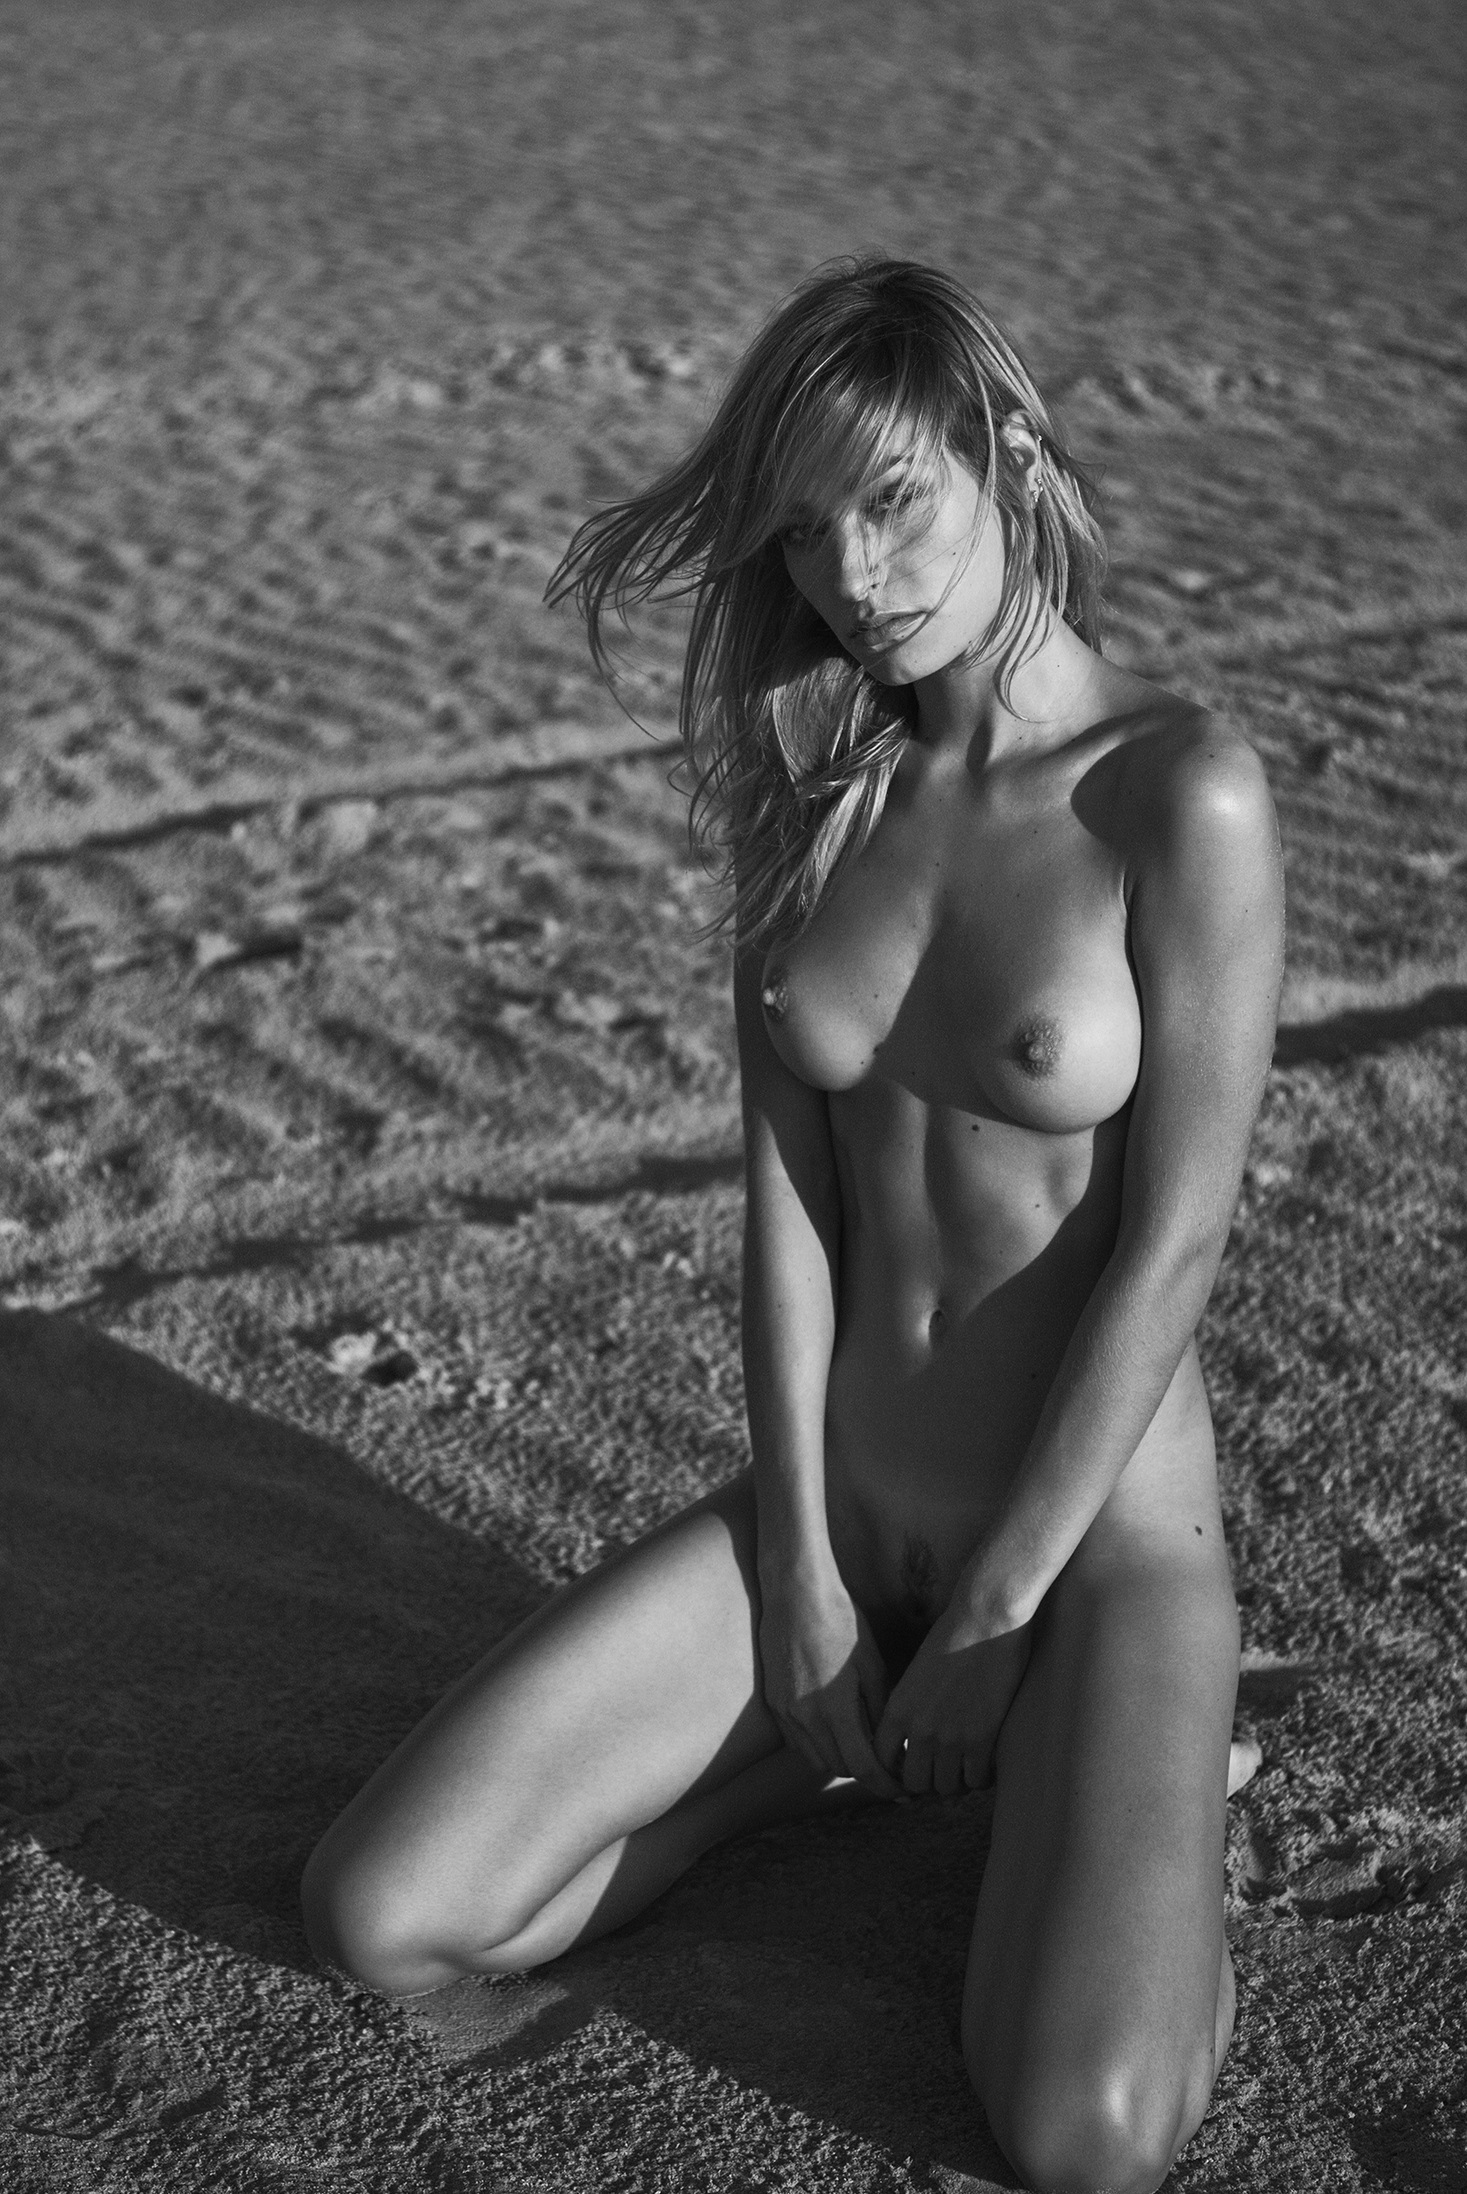 Justine Nicolas - Stefan Rappo photoshoot